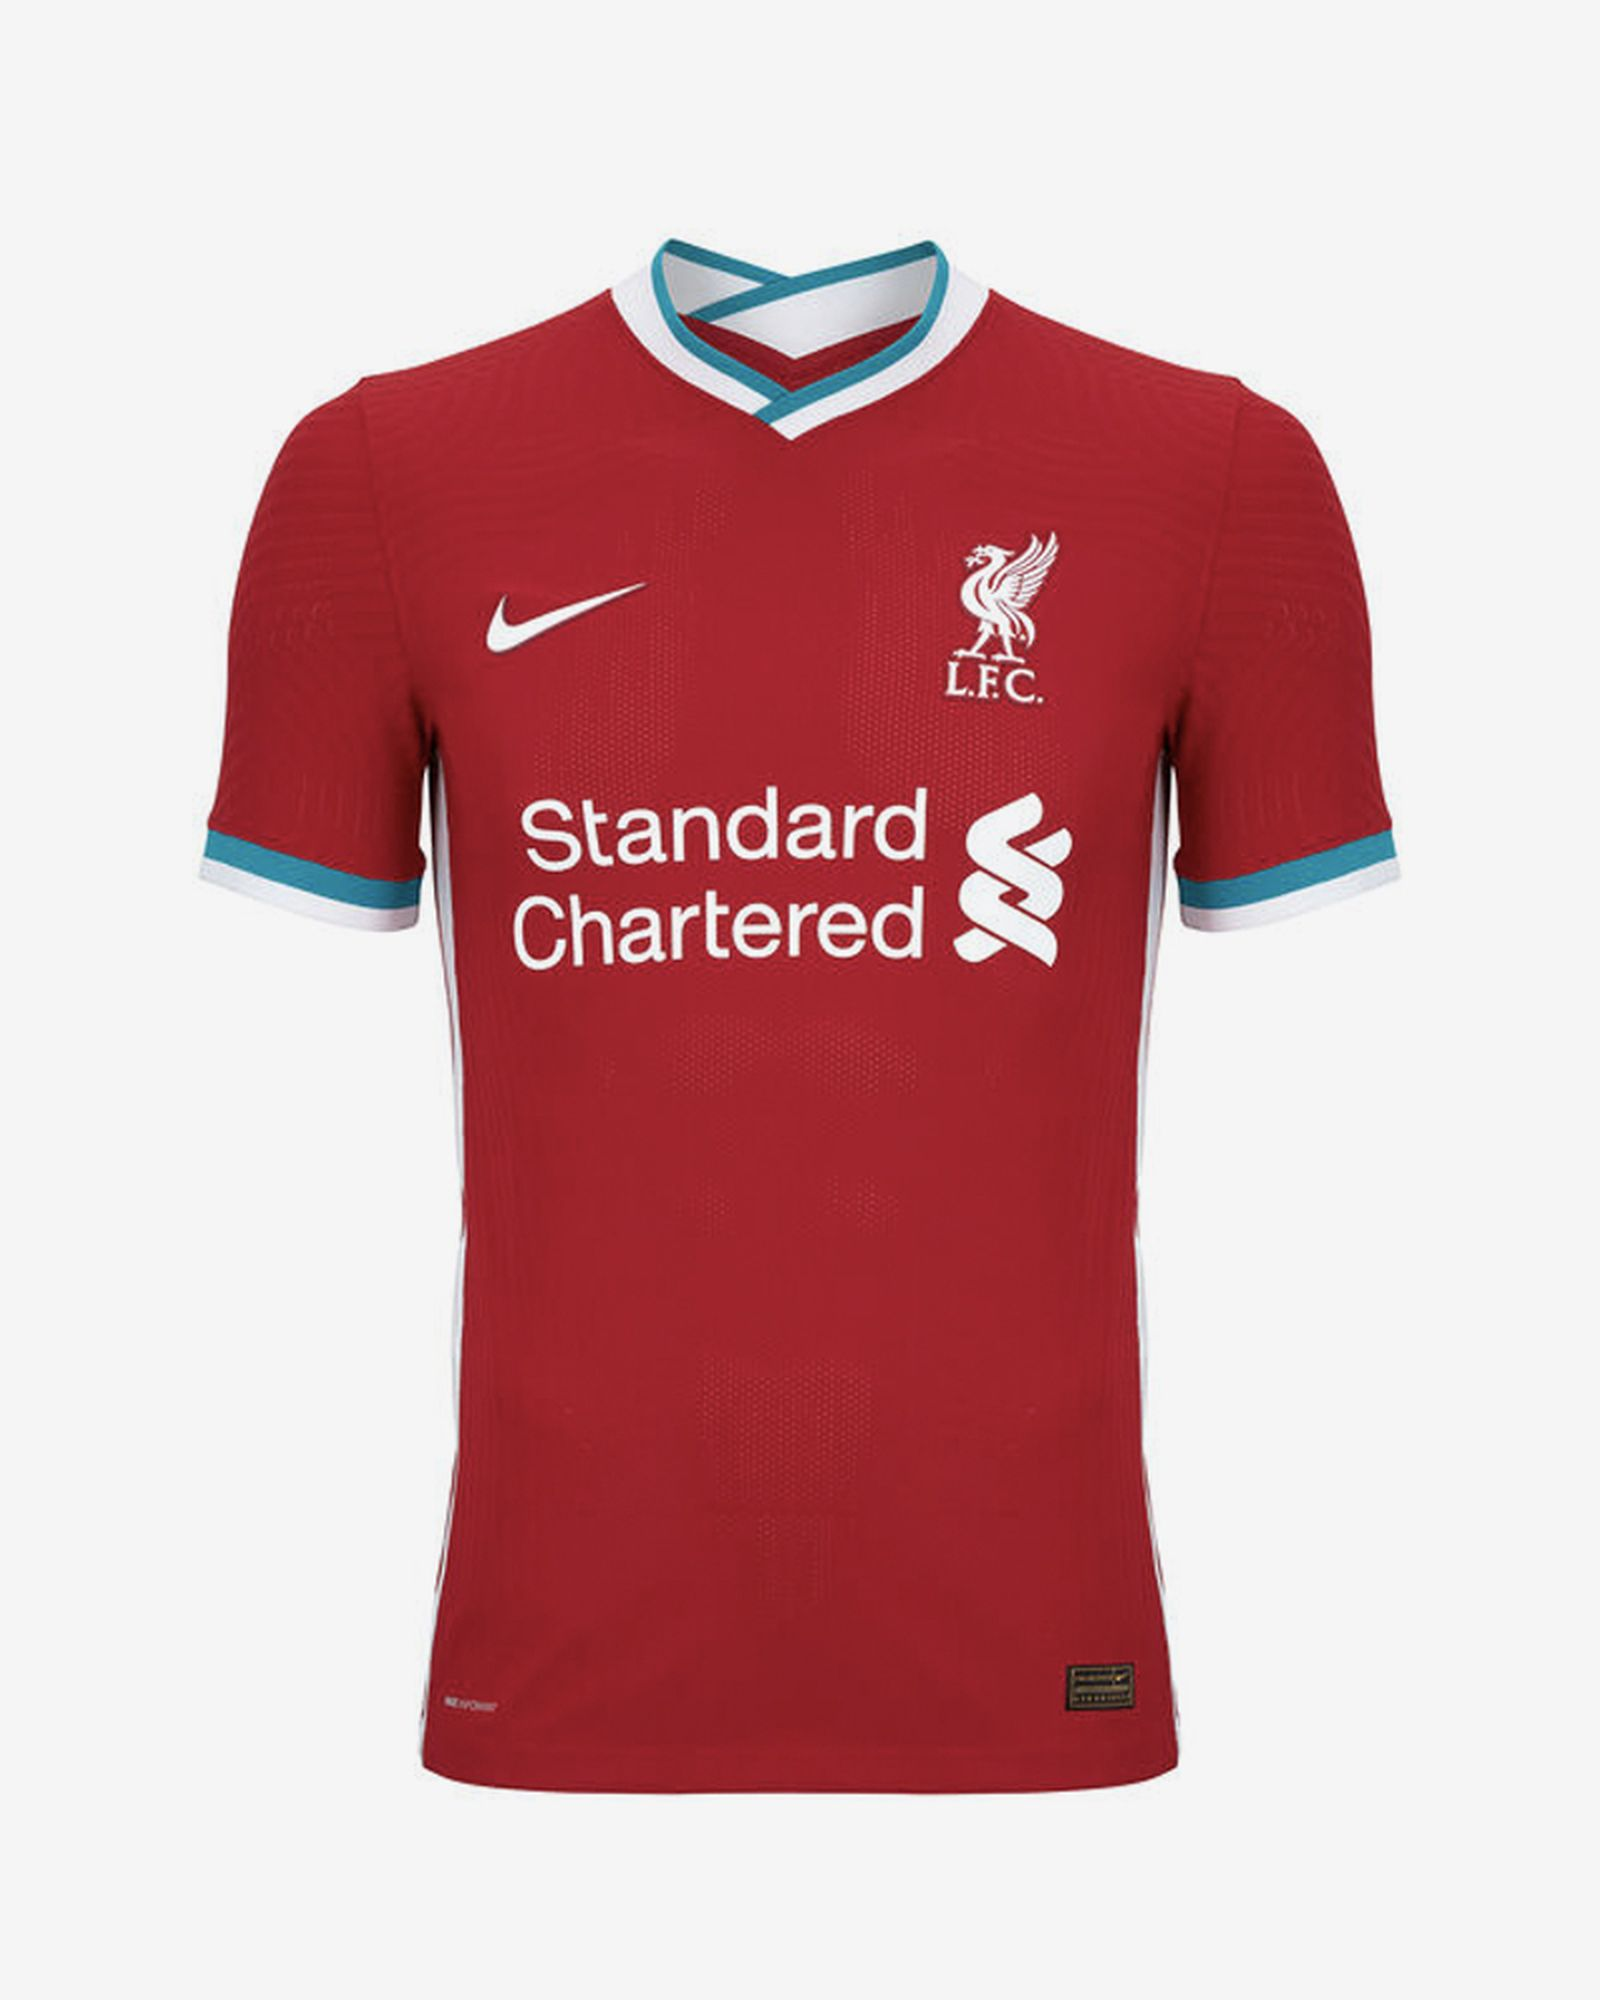 football-shirts-2020-review-01